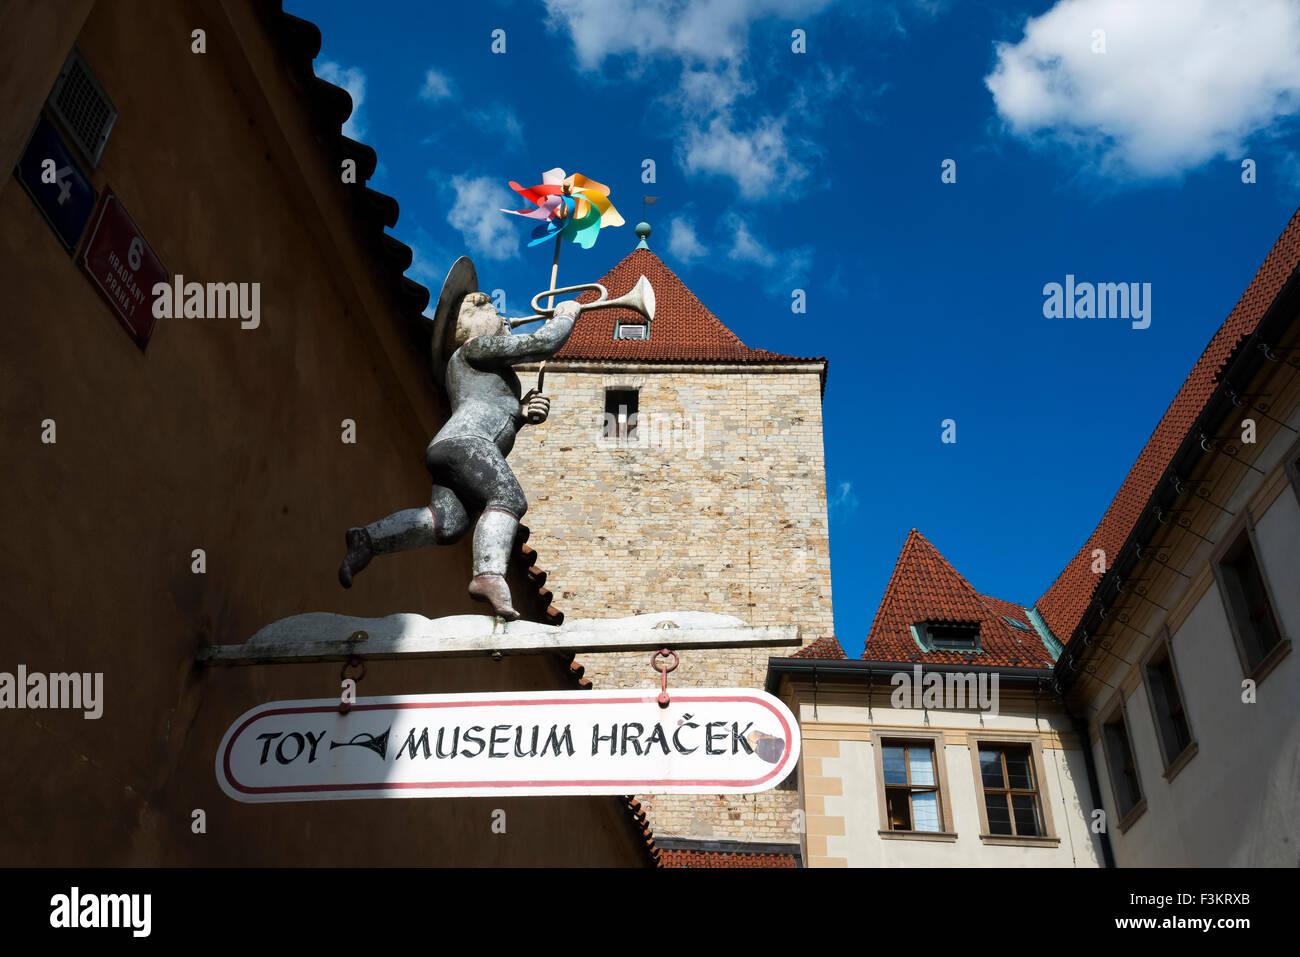 Spielzeugmuseum in Prag, Tschechische Republik Stockbild